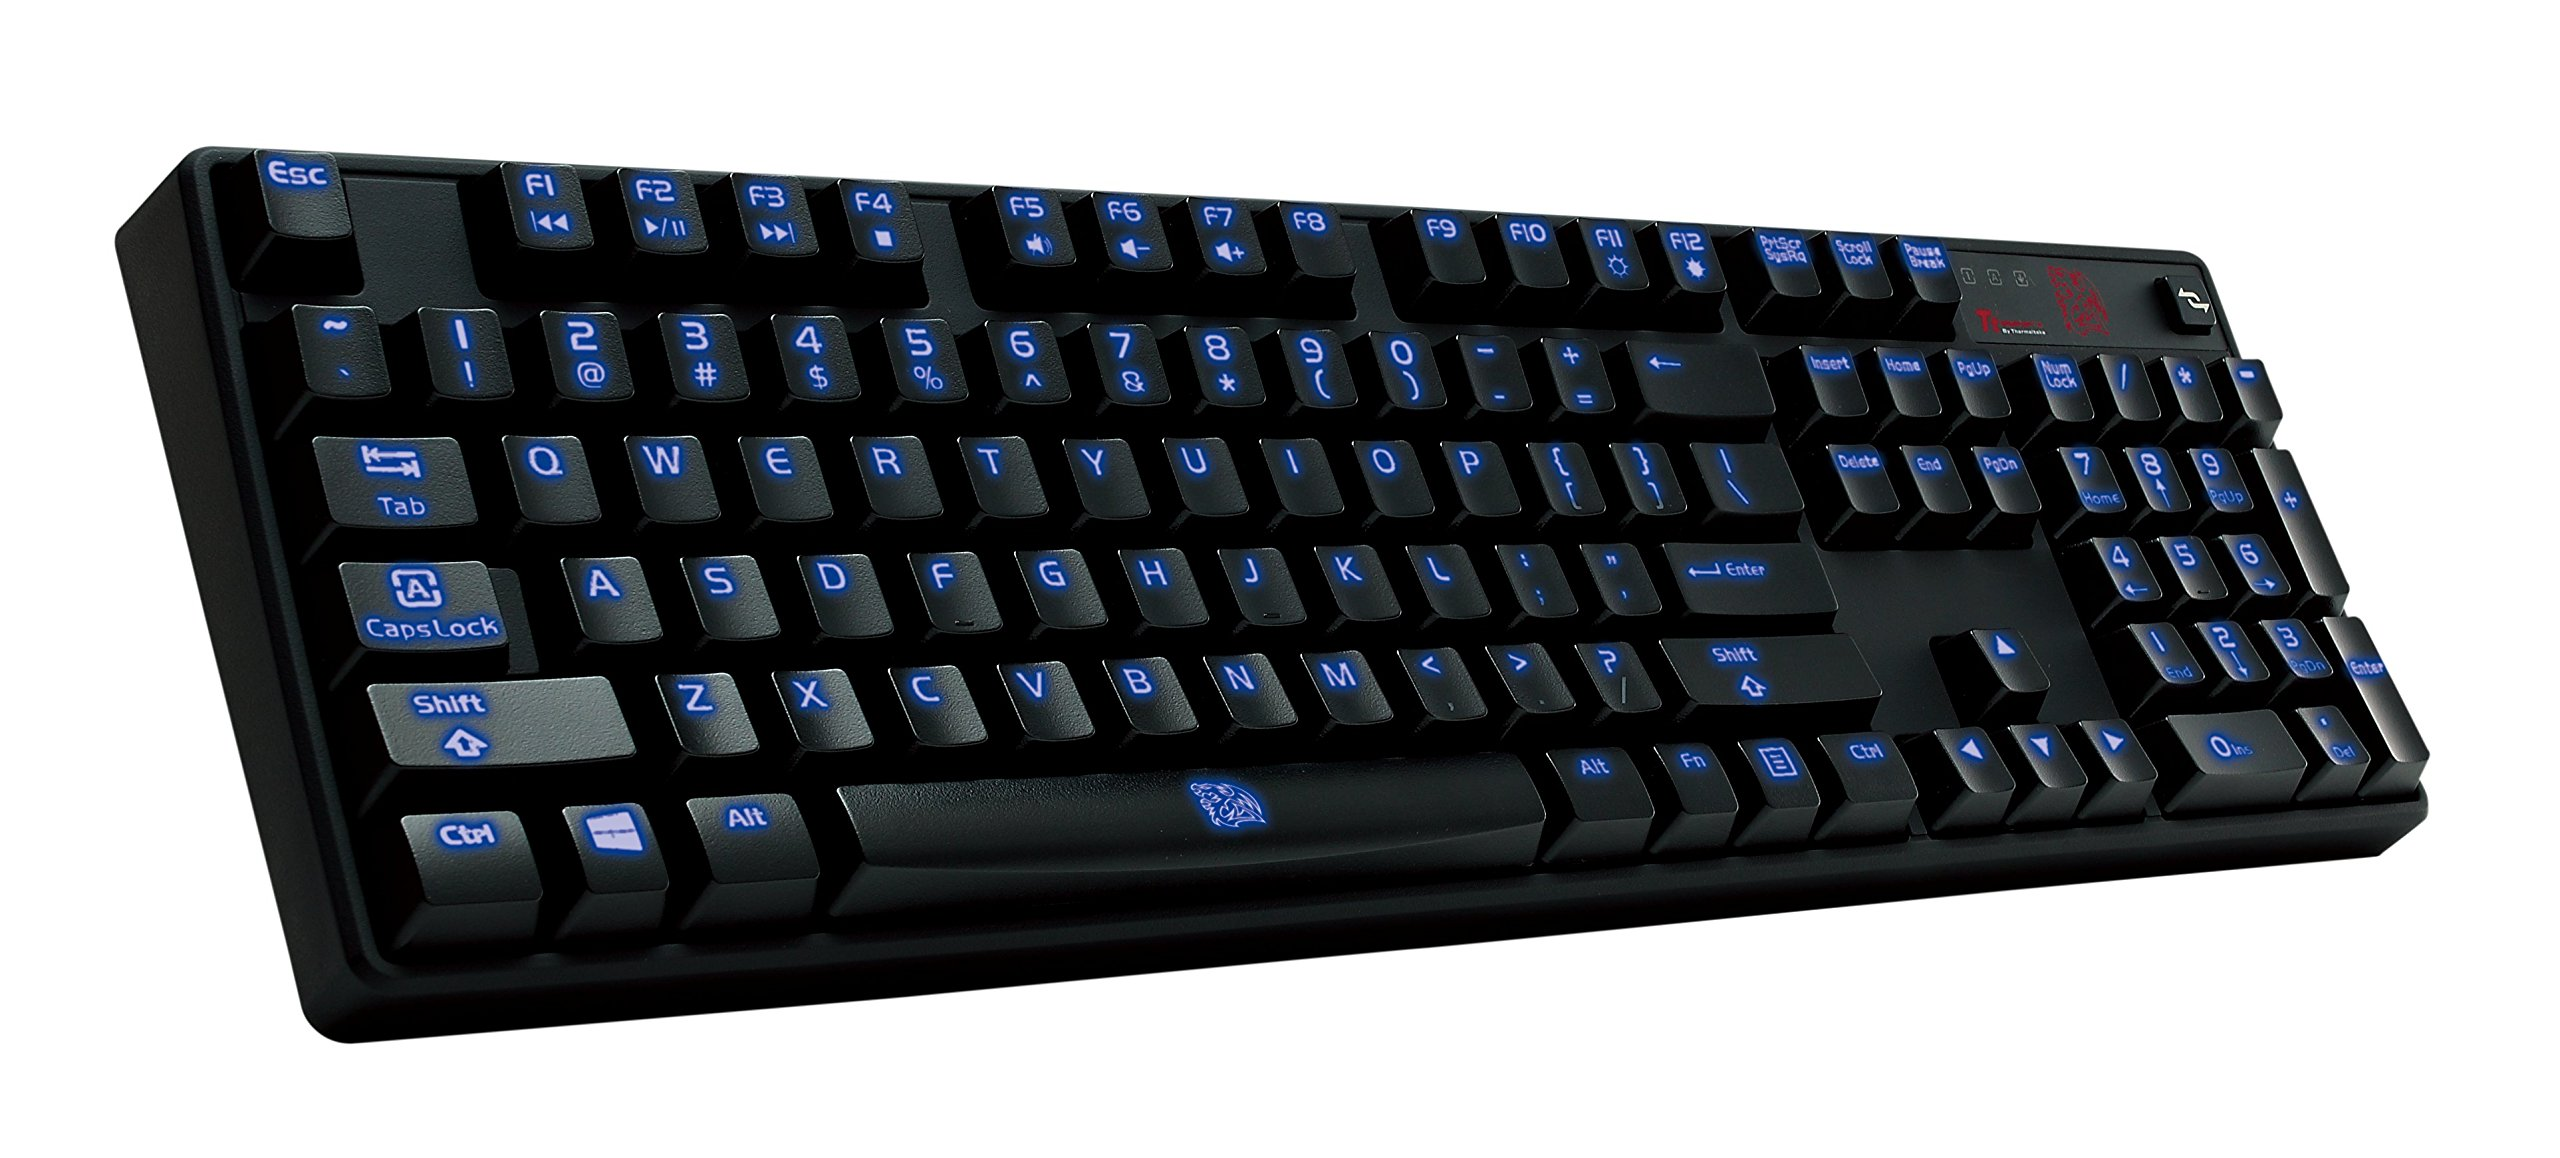 Thermaltake Tt e SPORTS Poseidon Z Blue Switches with 4-Level Brightness Blue LED Mechanical Gaming Keyboard KB-PIZ-KLBLUS-01 by Tt eSPORTS